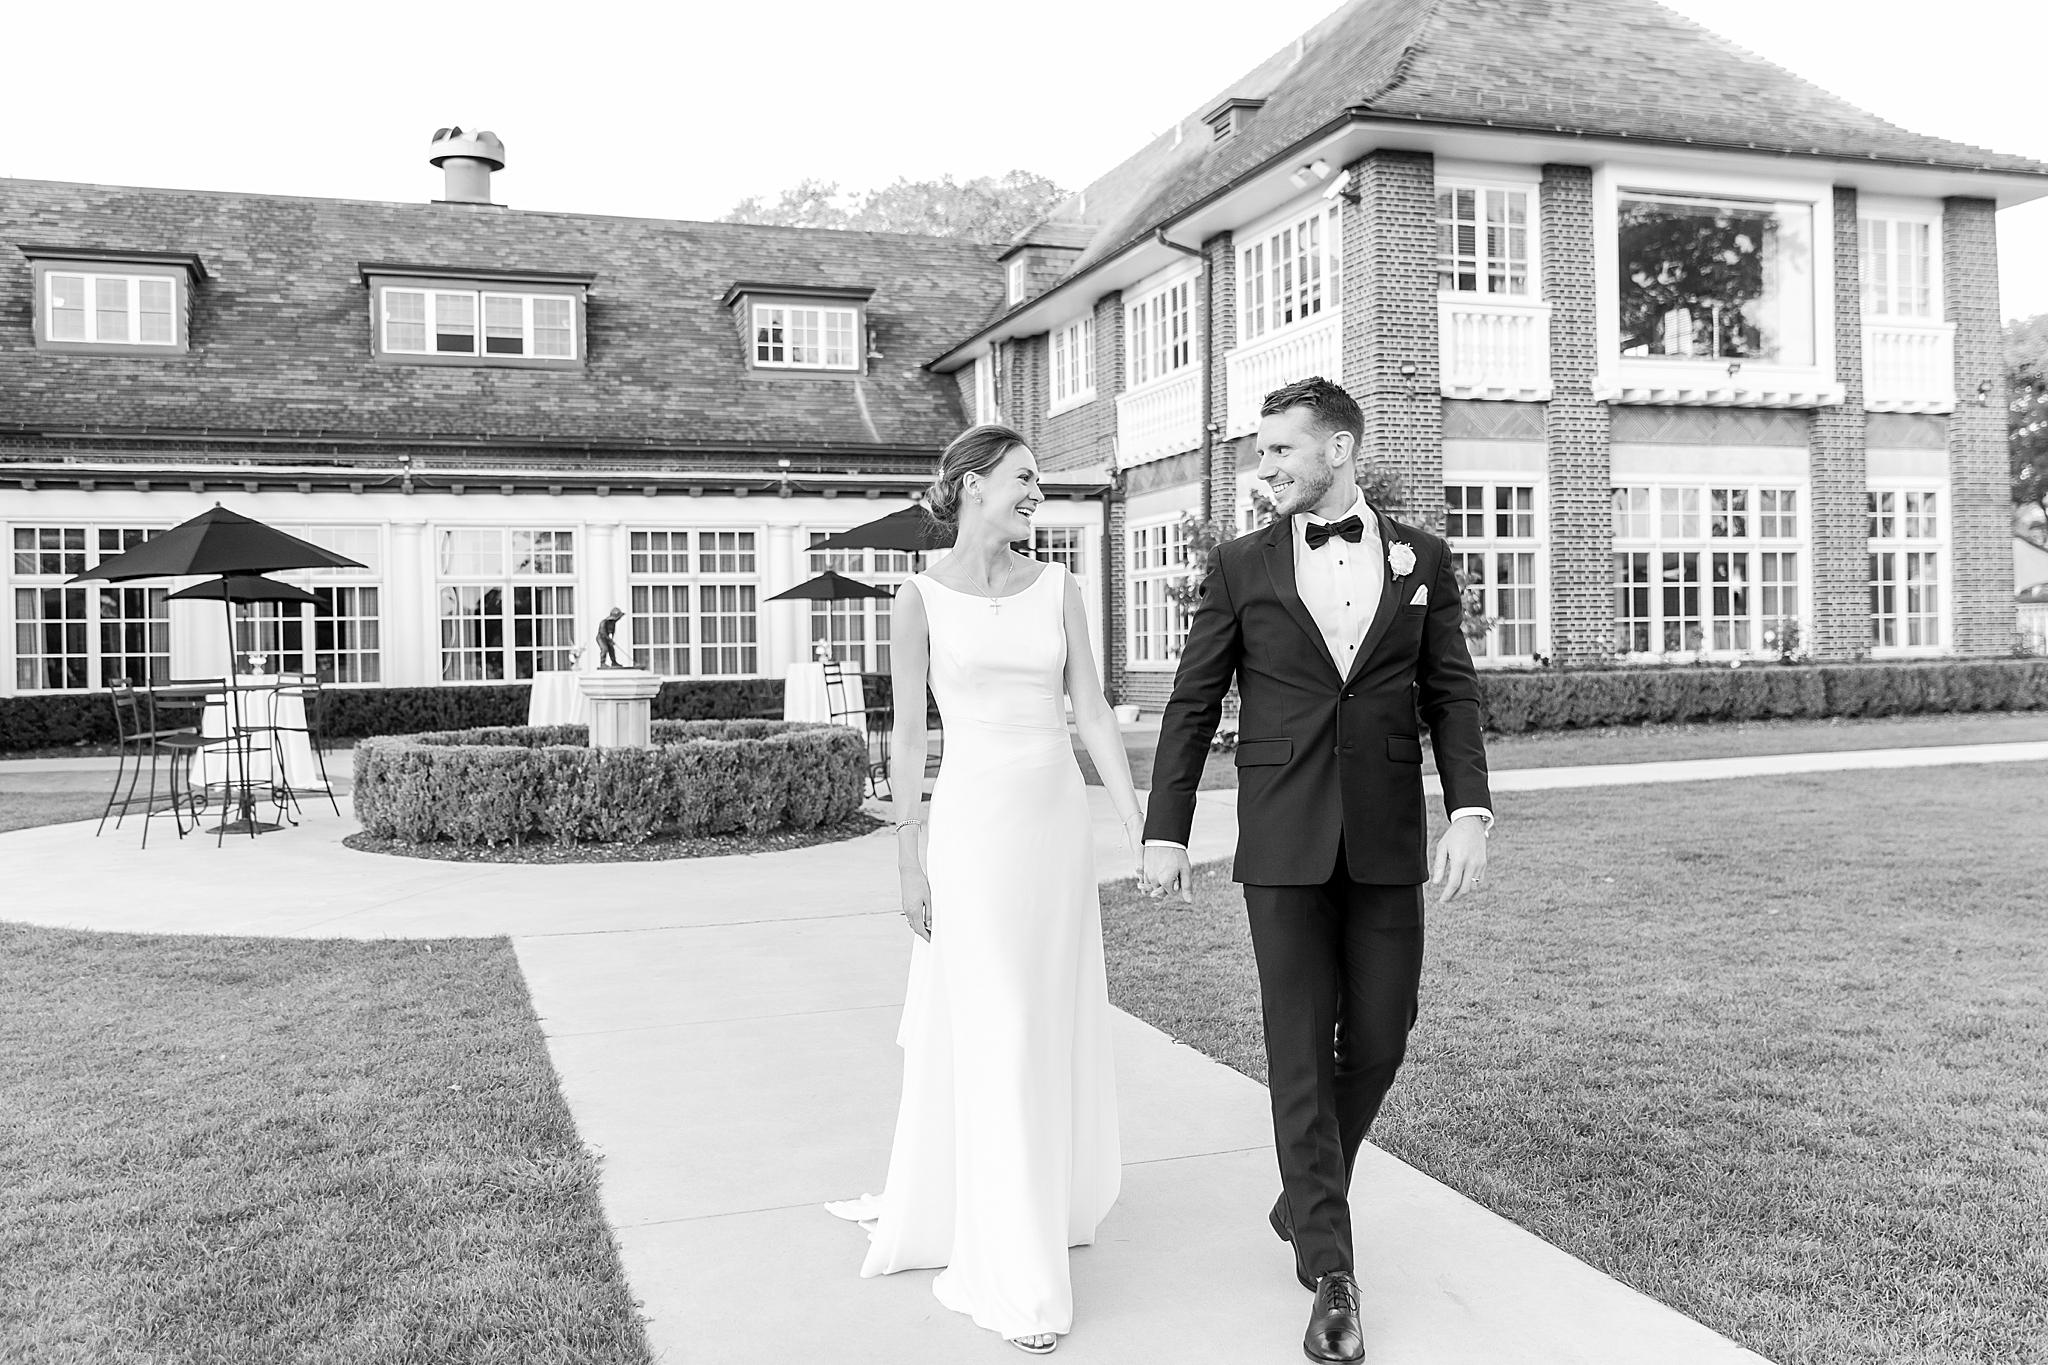 detroit-wedding-photographer-grosse-pointe-academy-chapel-detroit-golf-club-wedding-carly-matt-by-courtney-carolyn-photography_0112.jpg